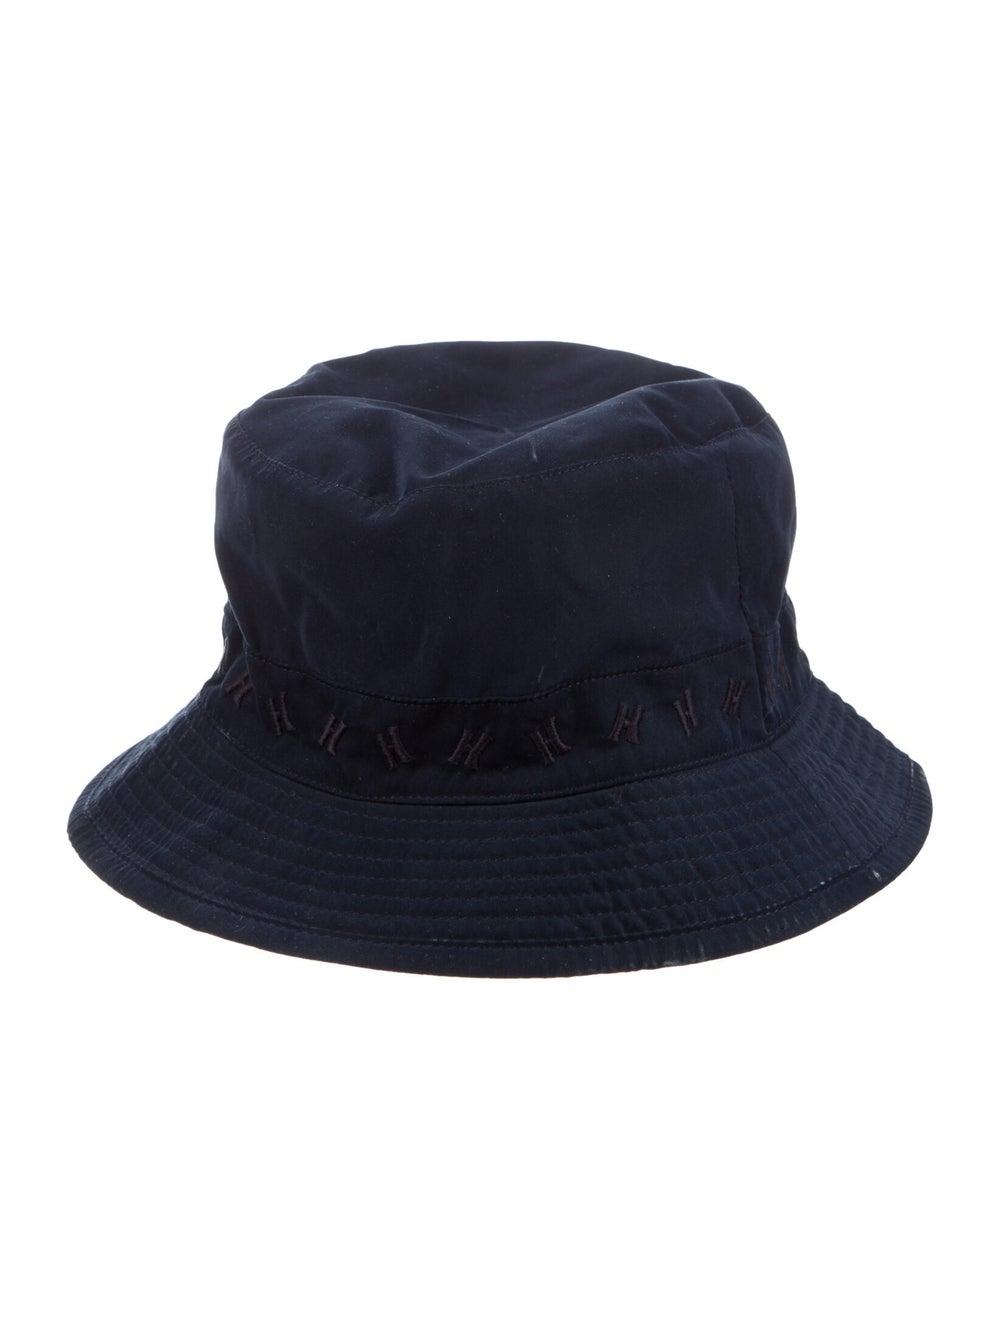 Hermès H Bucket Hat Navy - image 2